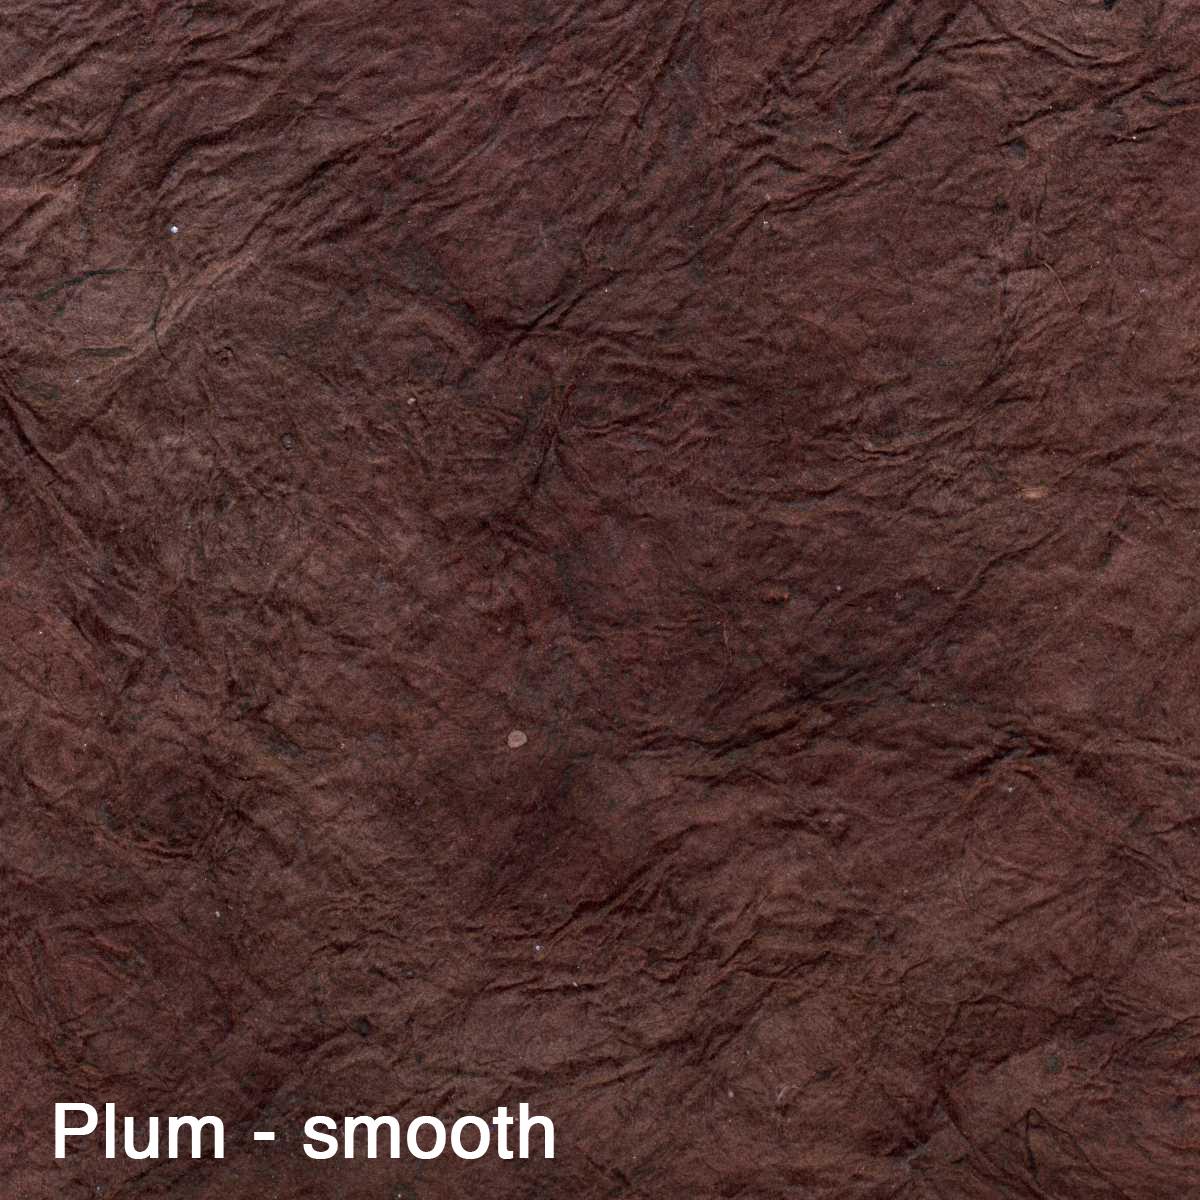 Plum face.jpg